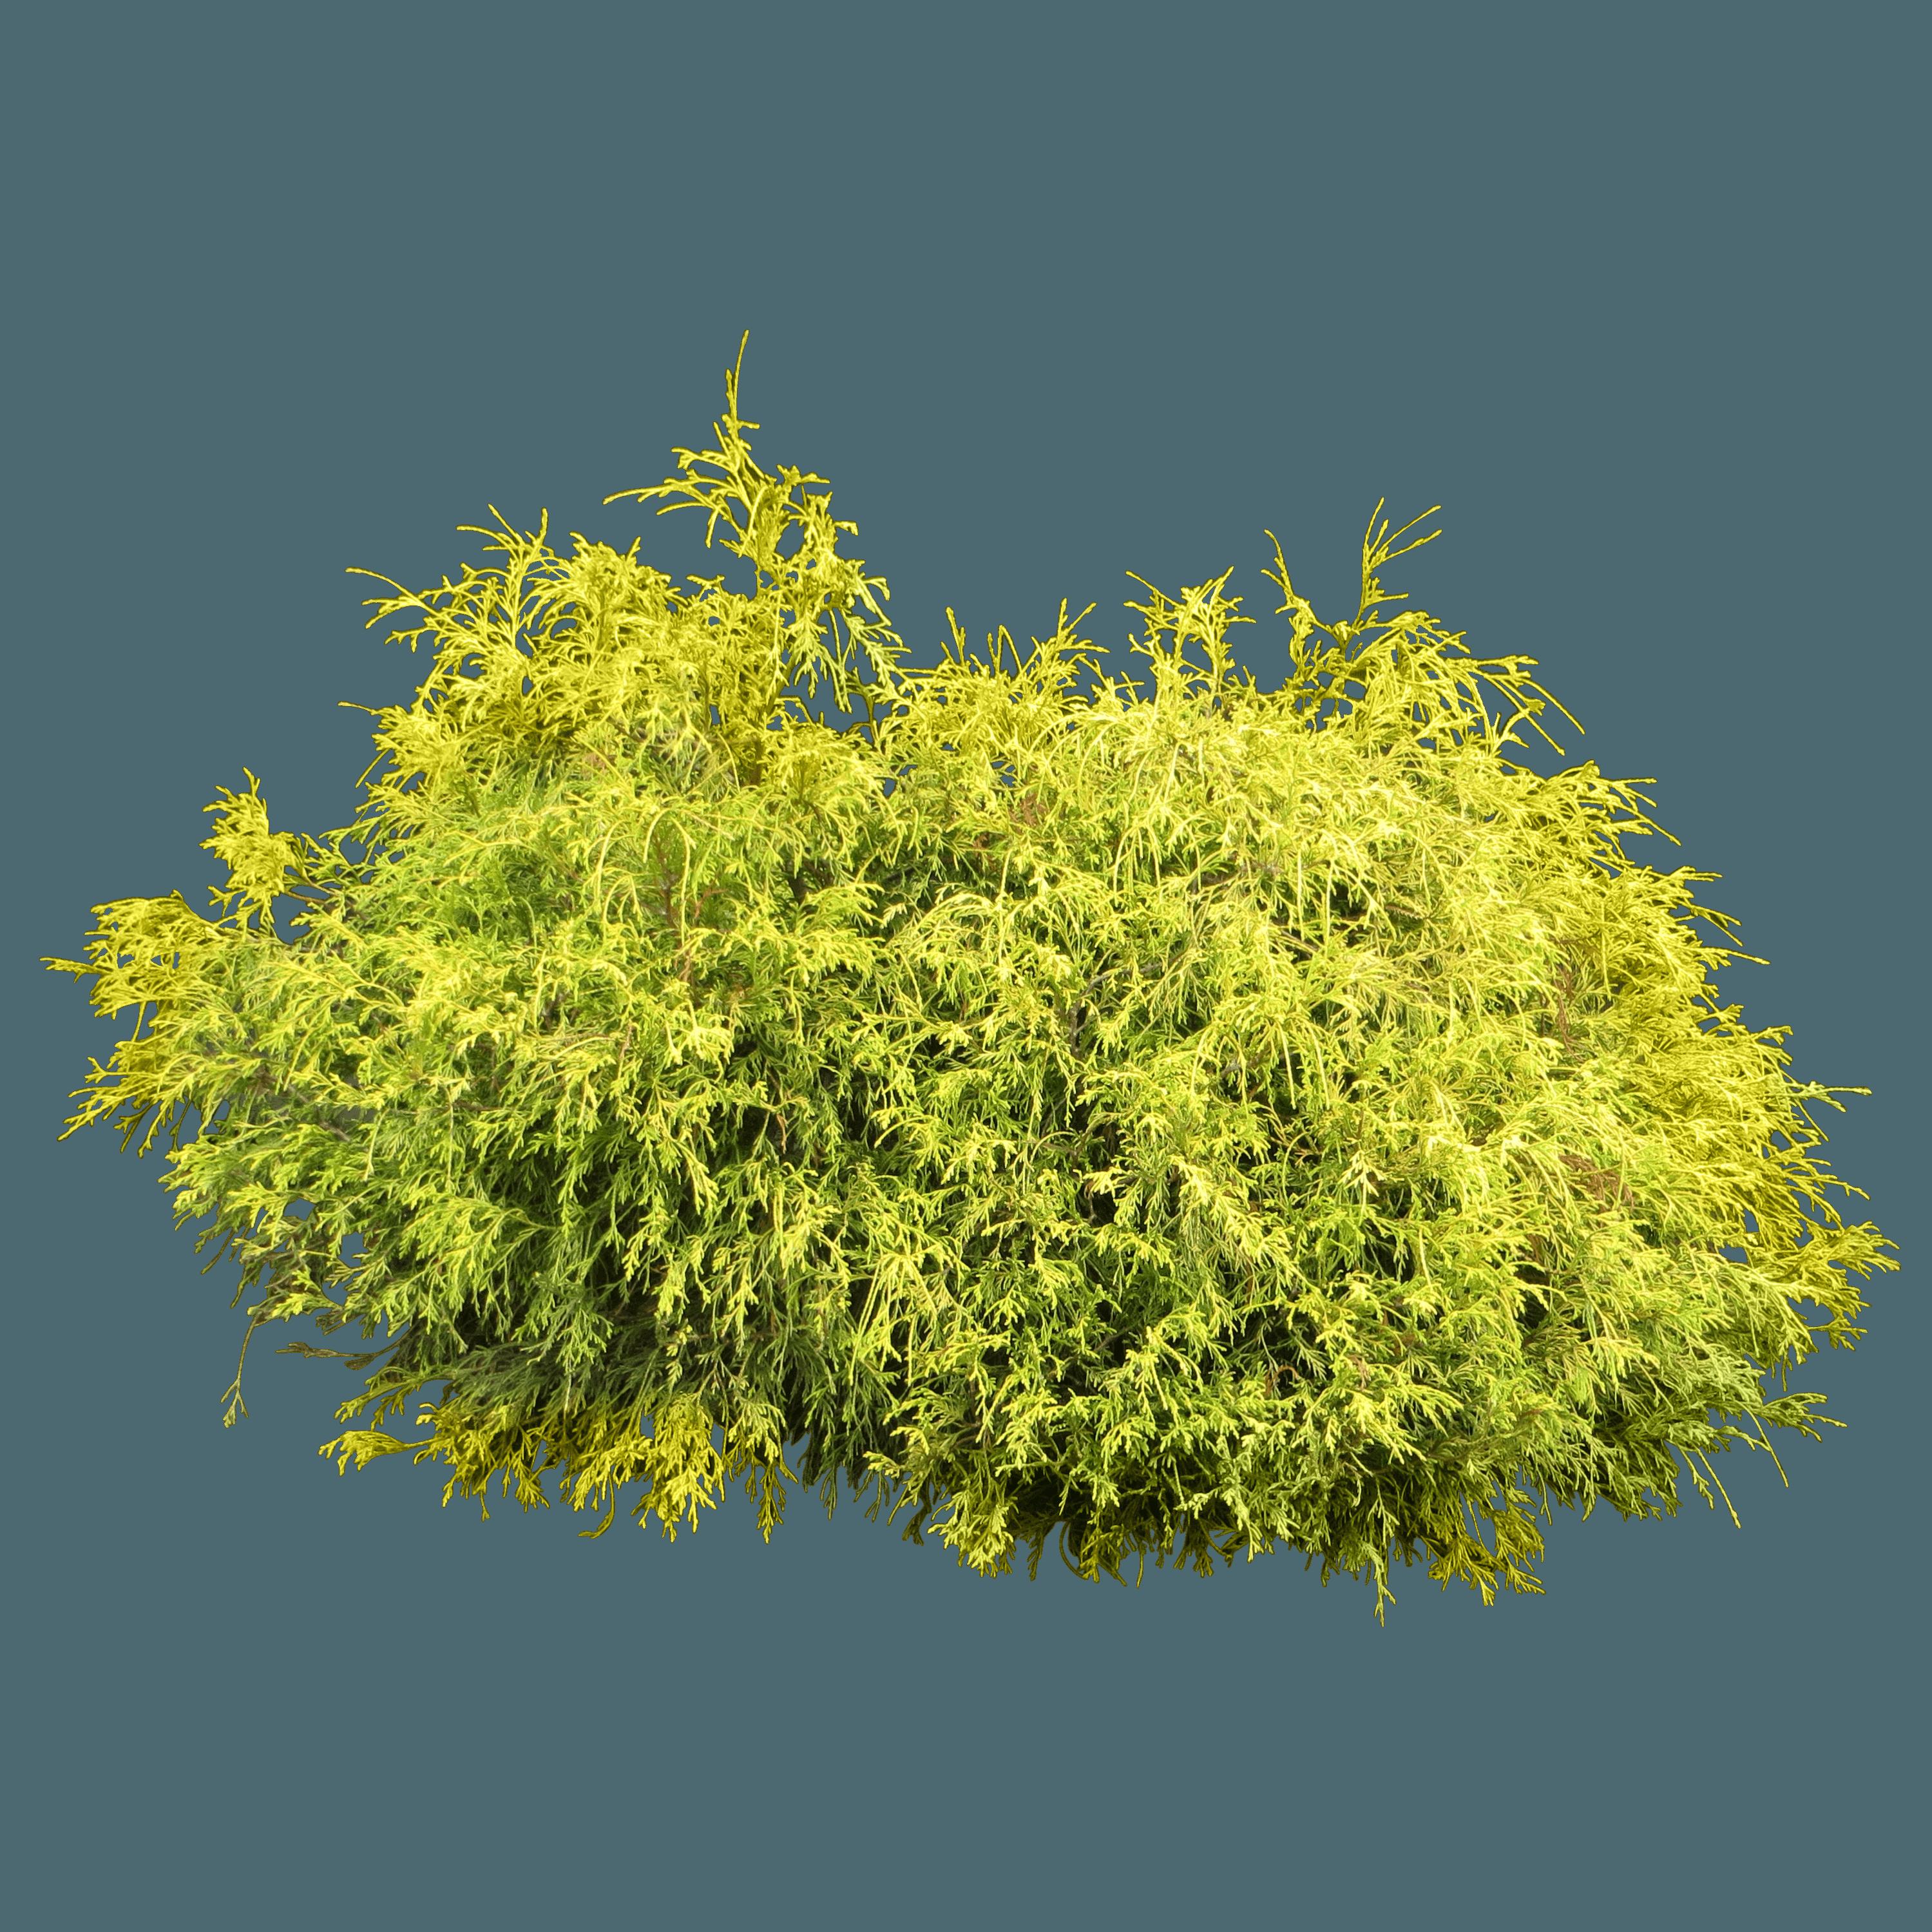 Download Bush Plant Png Image HQ PNG Image | FreePNGImg